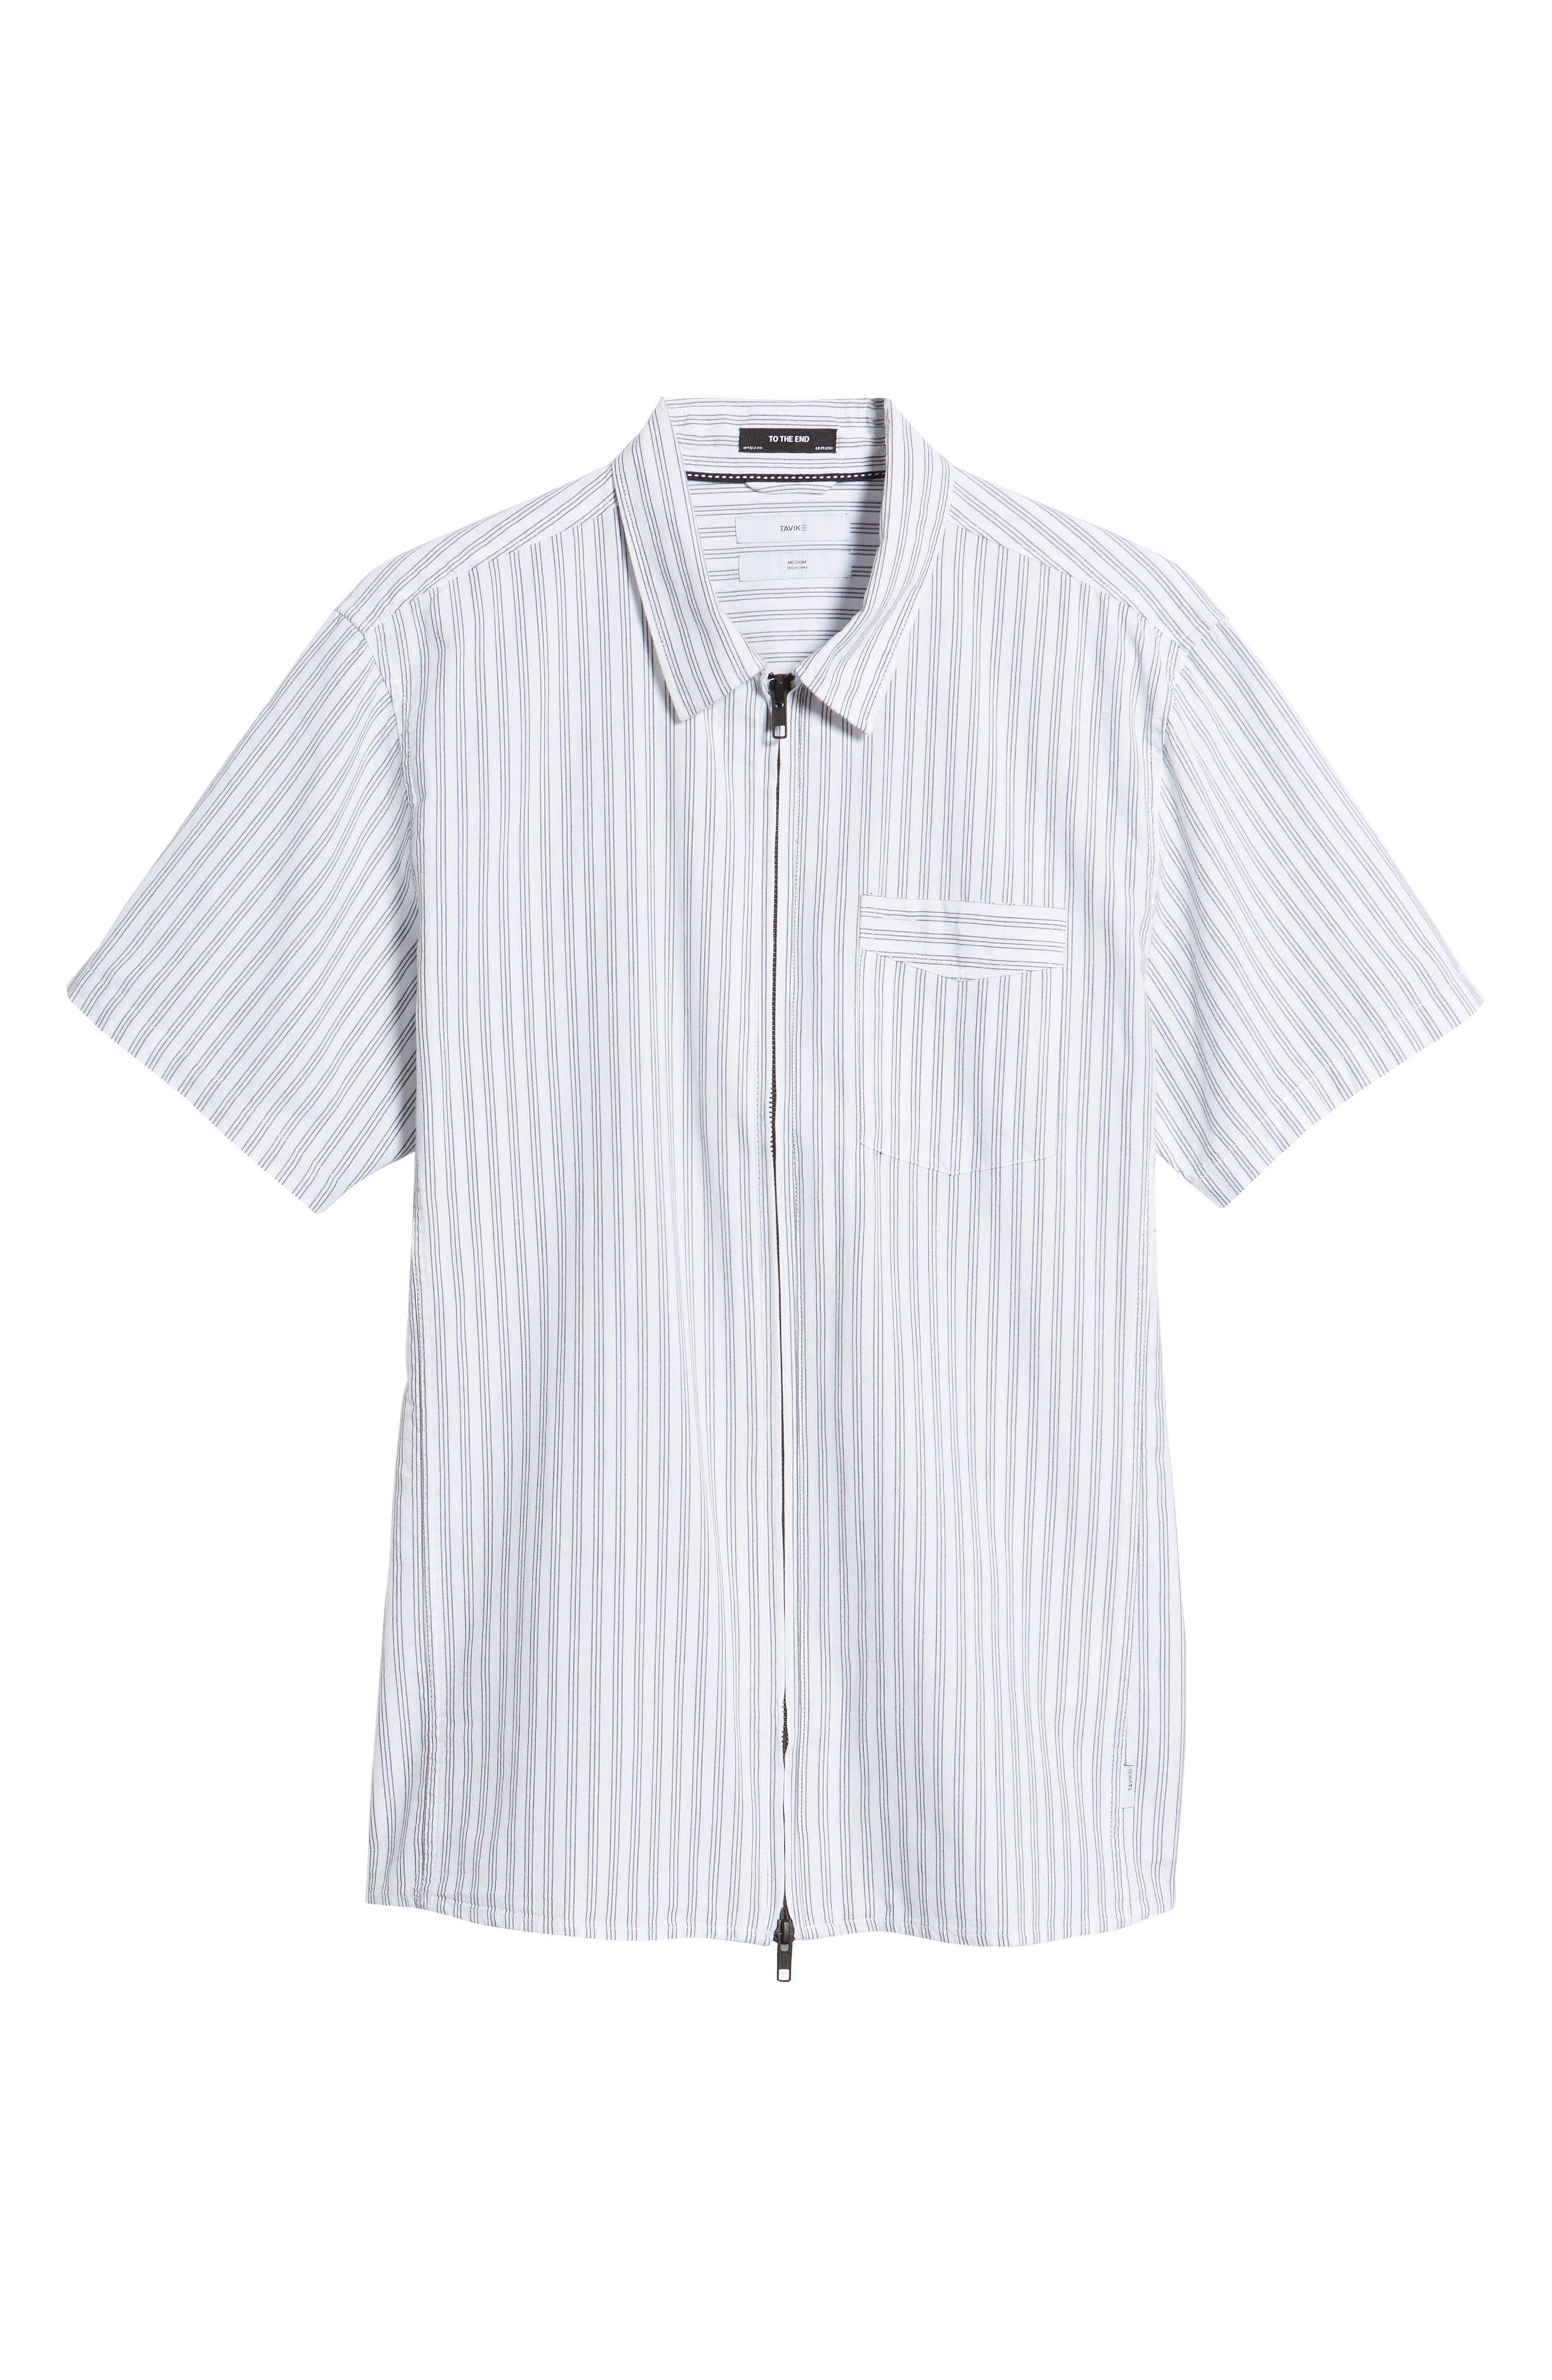 Rollins Woven Shirt,                             Alternate thumbnail 6, color,                             Black/White Stripe